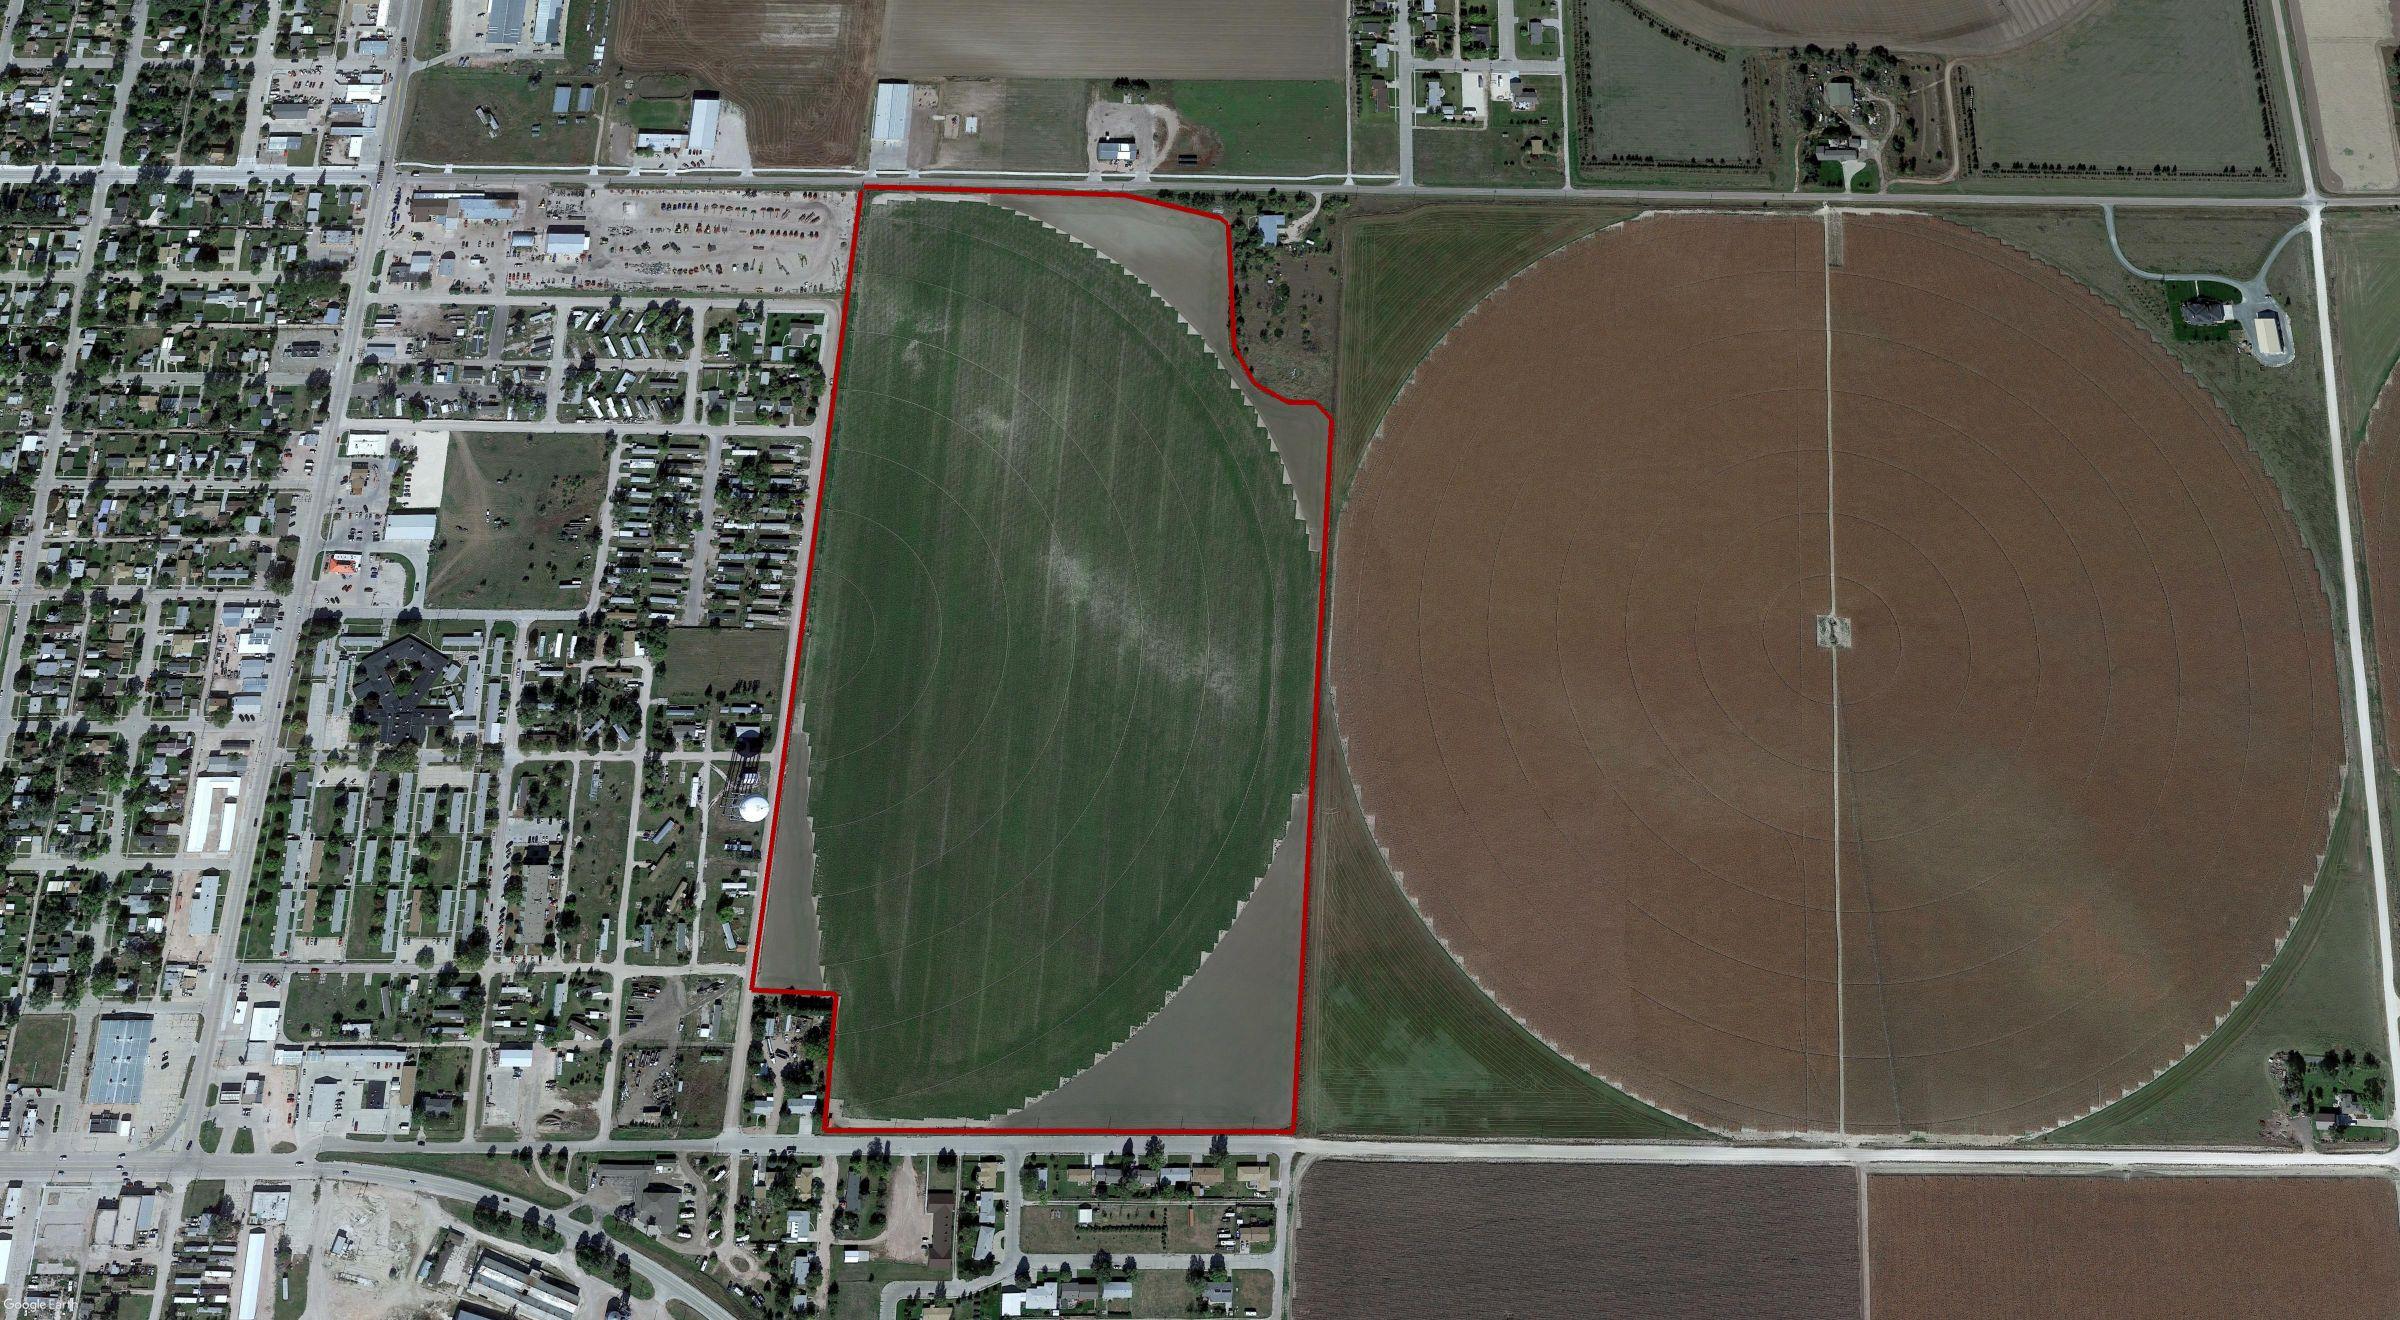 land-box-butte-county-nebraska-73-acres-listing-number-15097-1-2020-08-20-141331.jpg